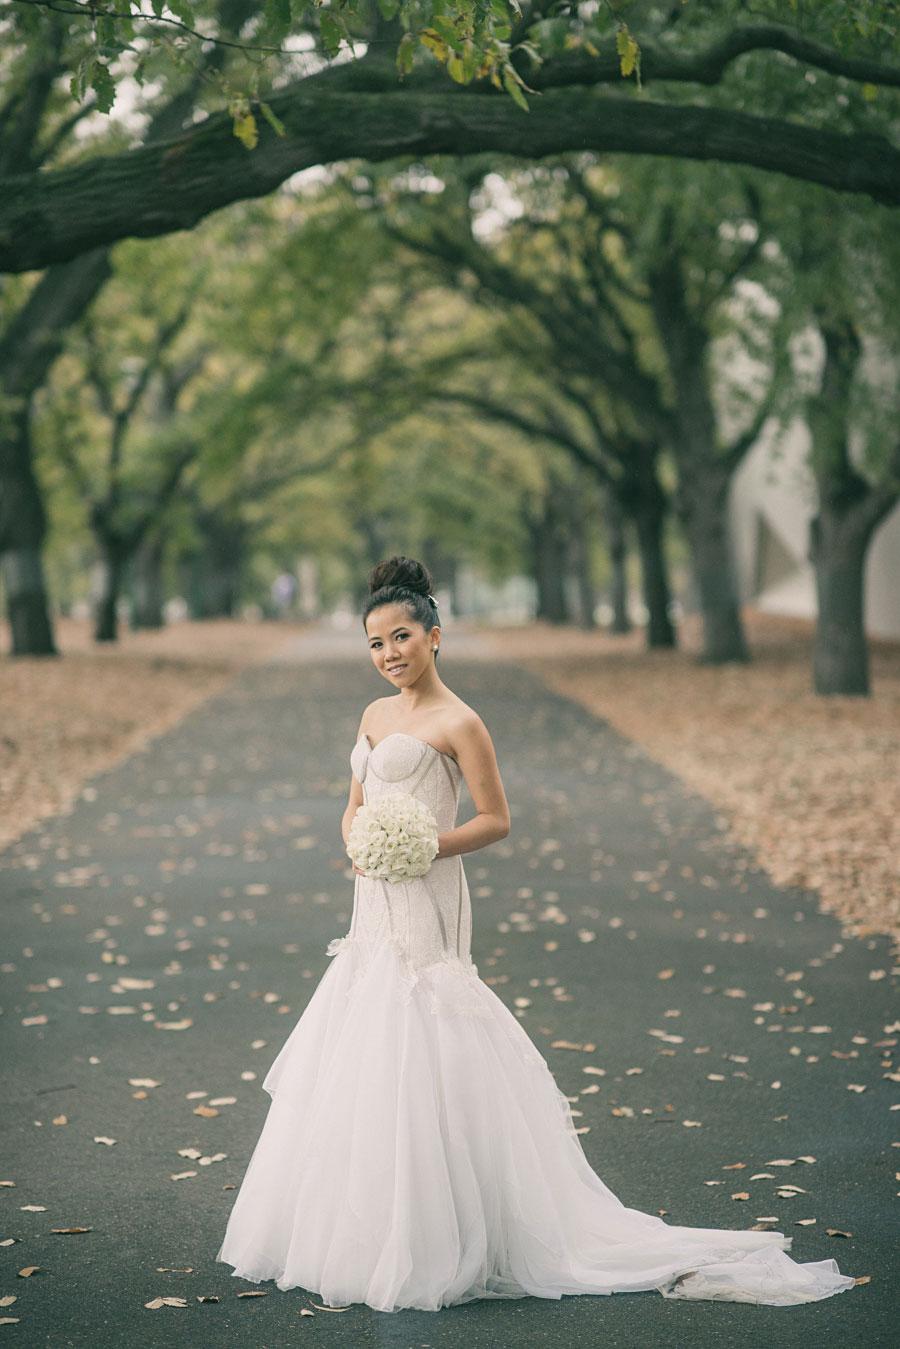 wedding-photography-melbourne-daniel-bilsborough-186.jpg